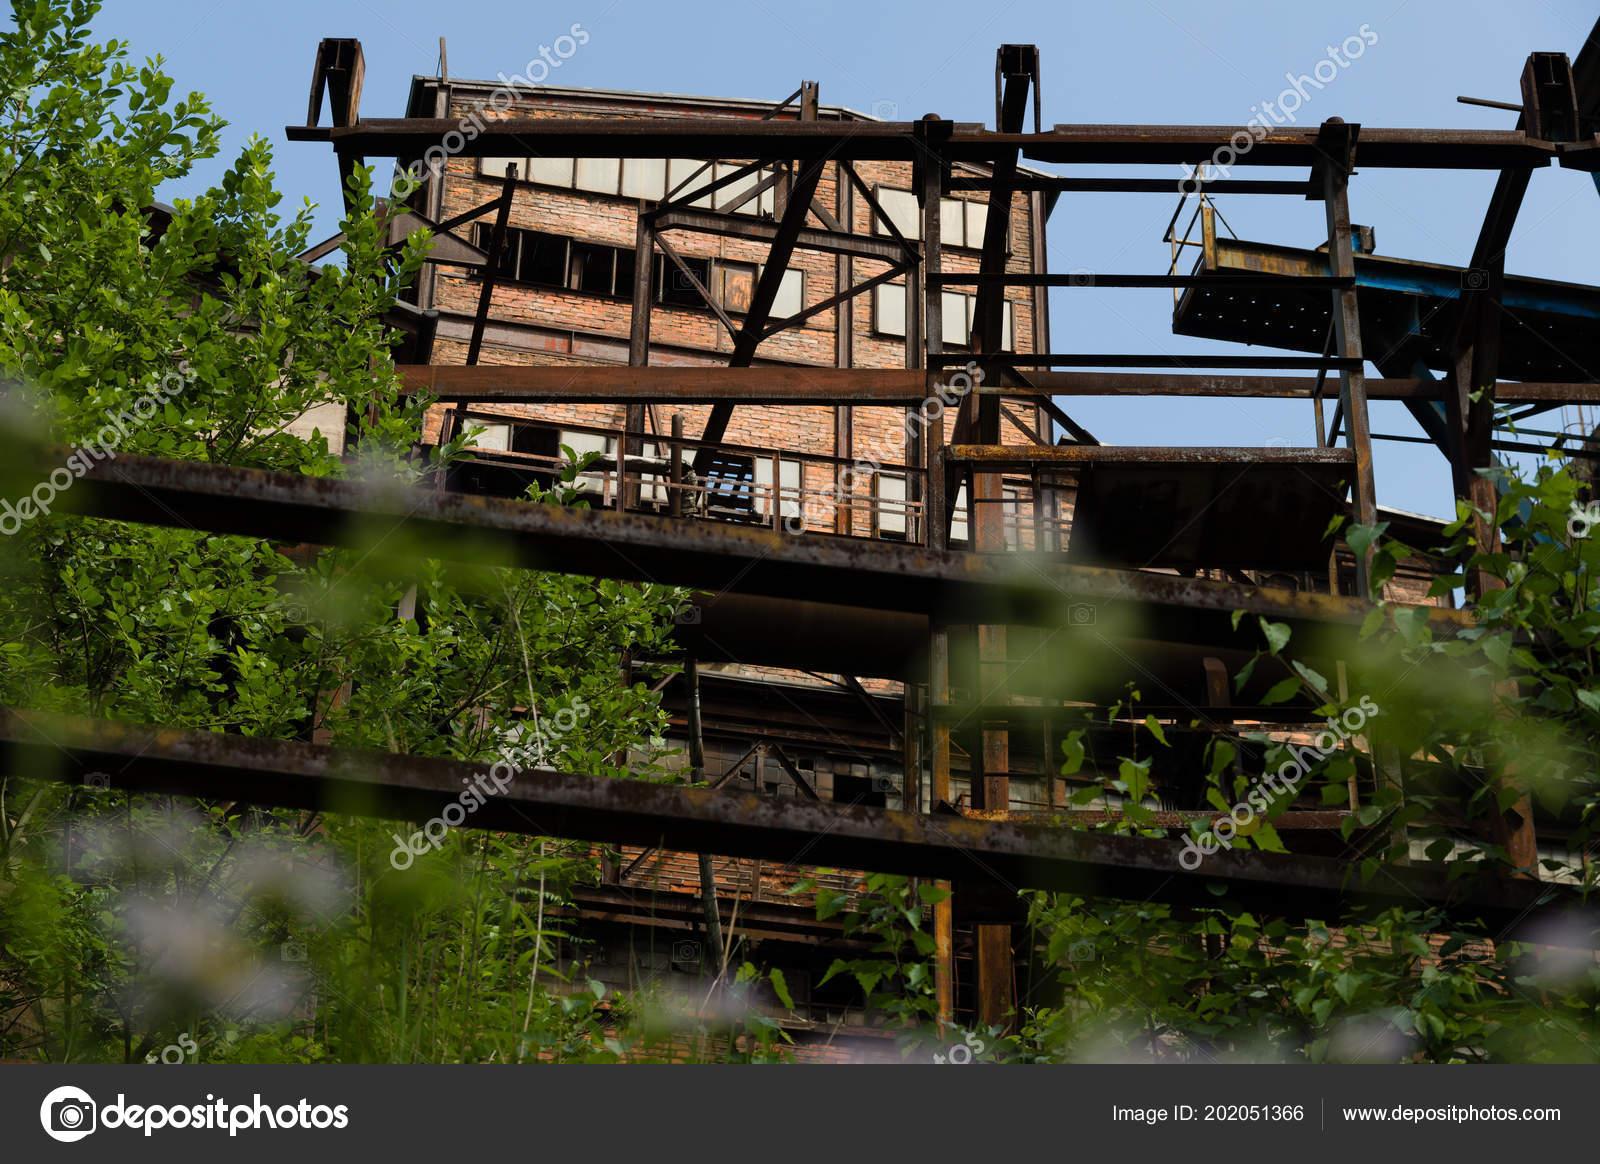 Abandoned Building Dolni Vitkovice Industrial Area Ostrava Czech Republic Stock Photo C Vidumg 202051366